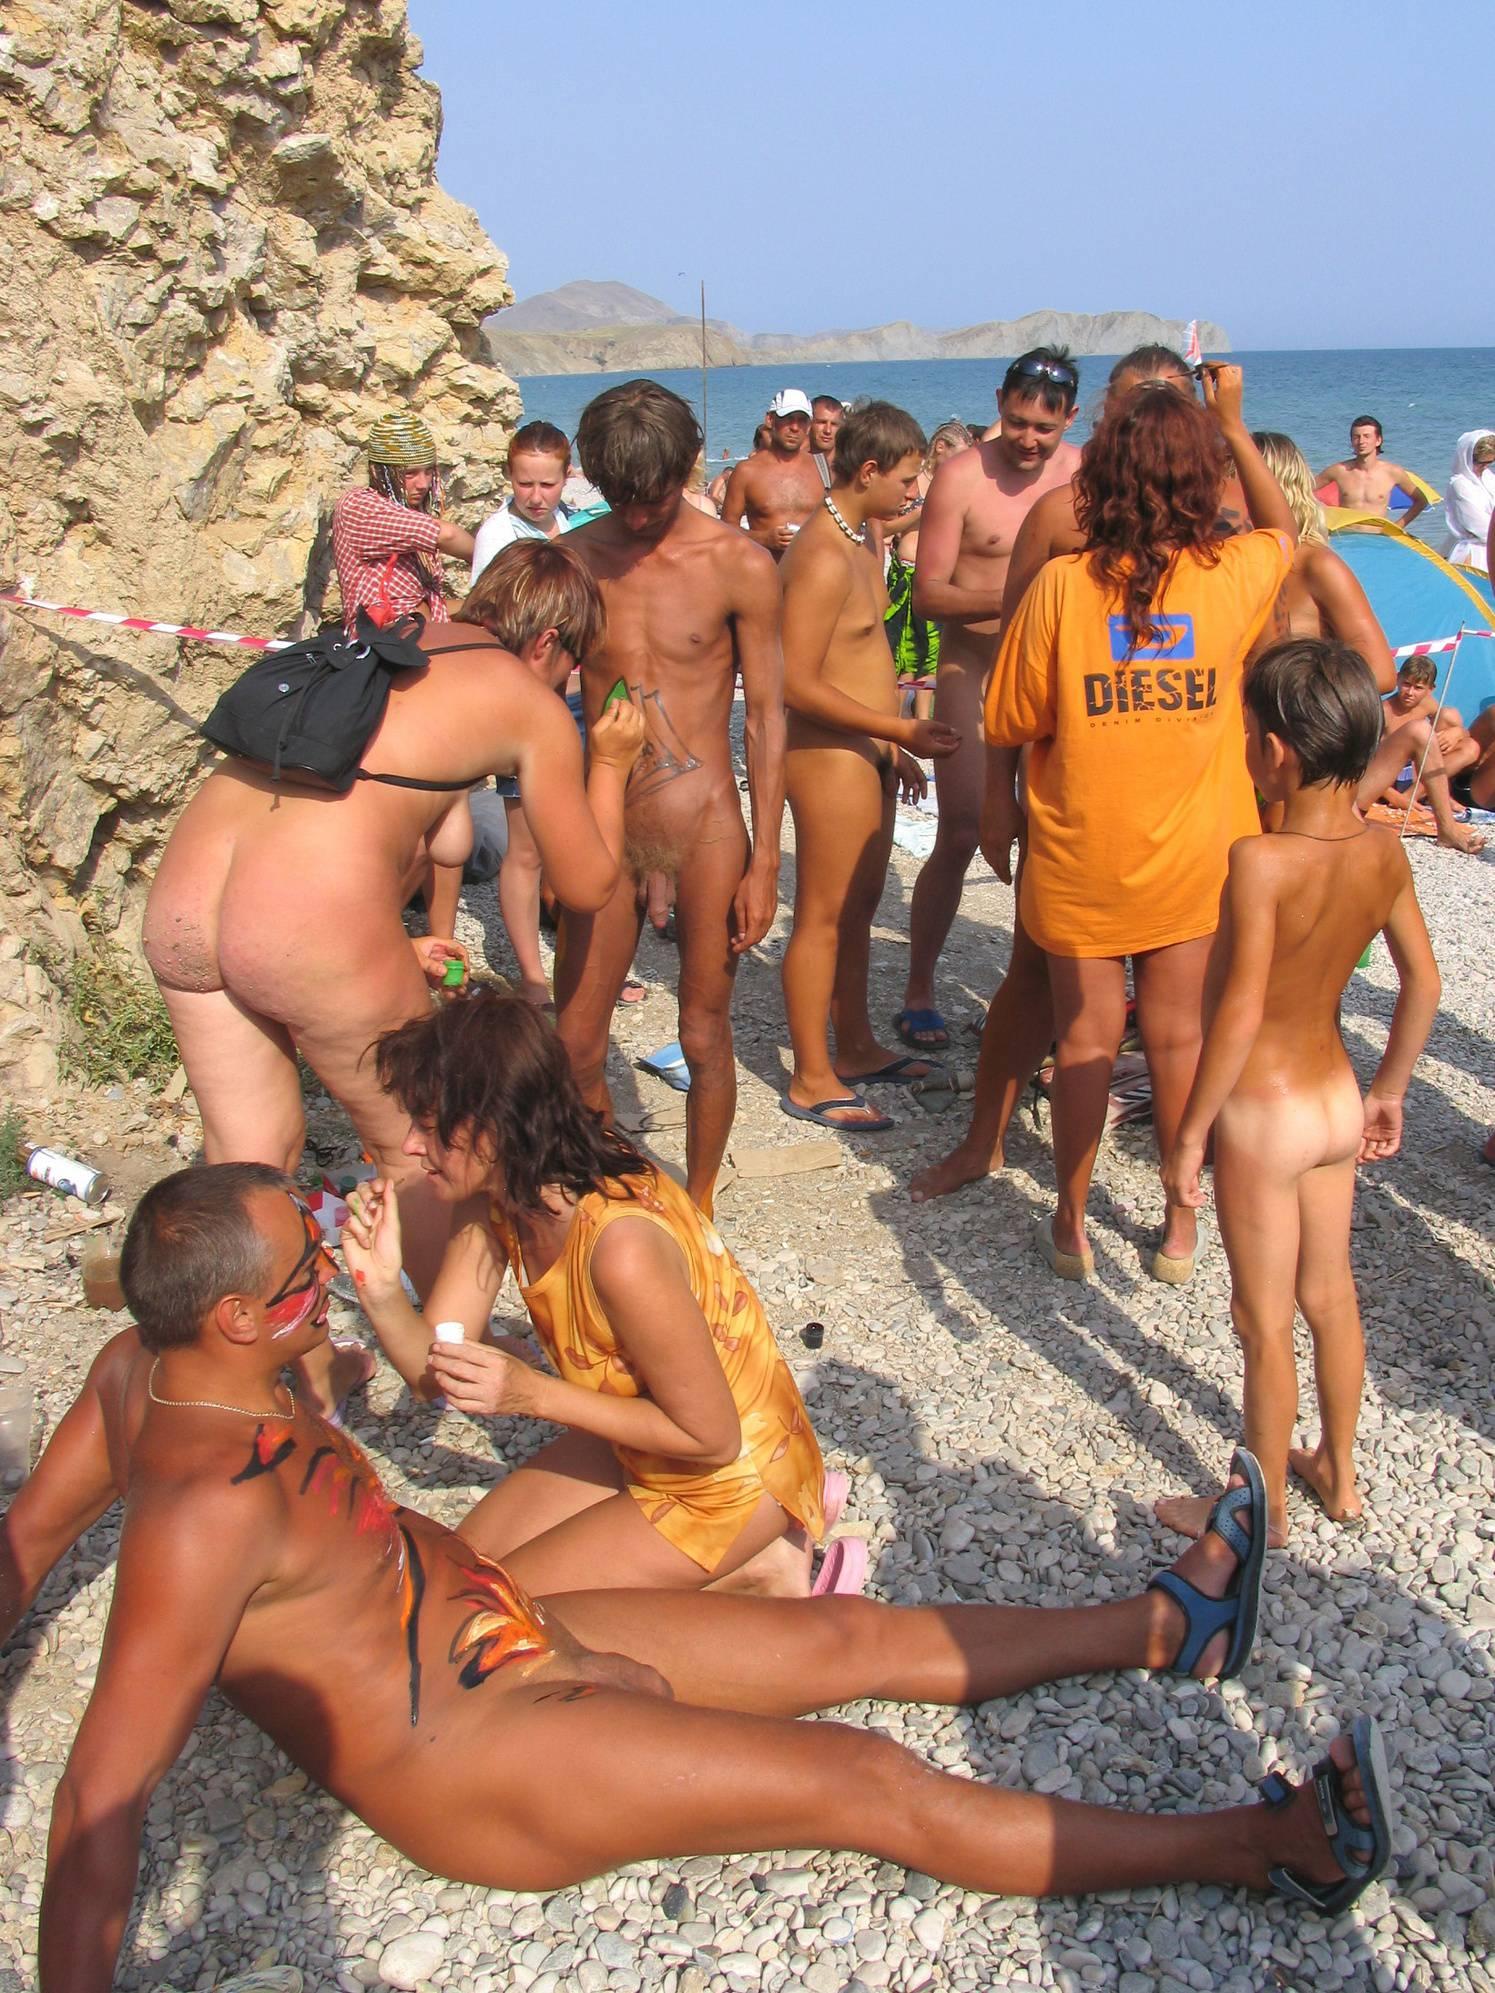 Nudist Pictures Outdoor Painted Teenager - 1